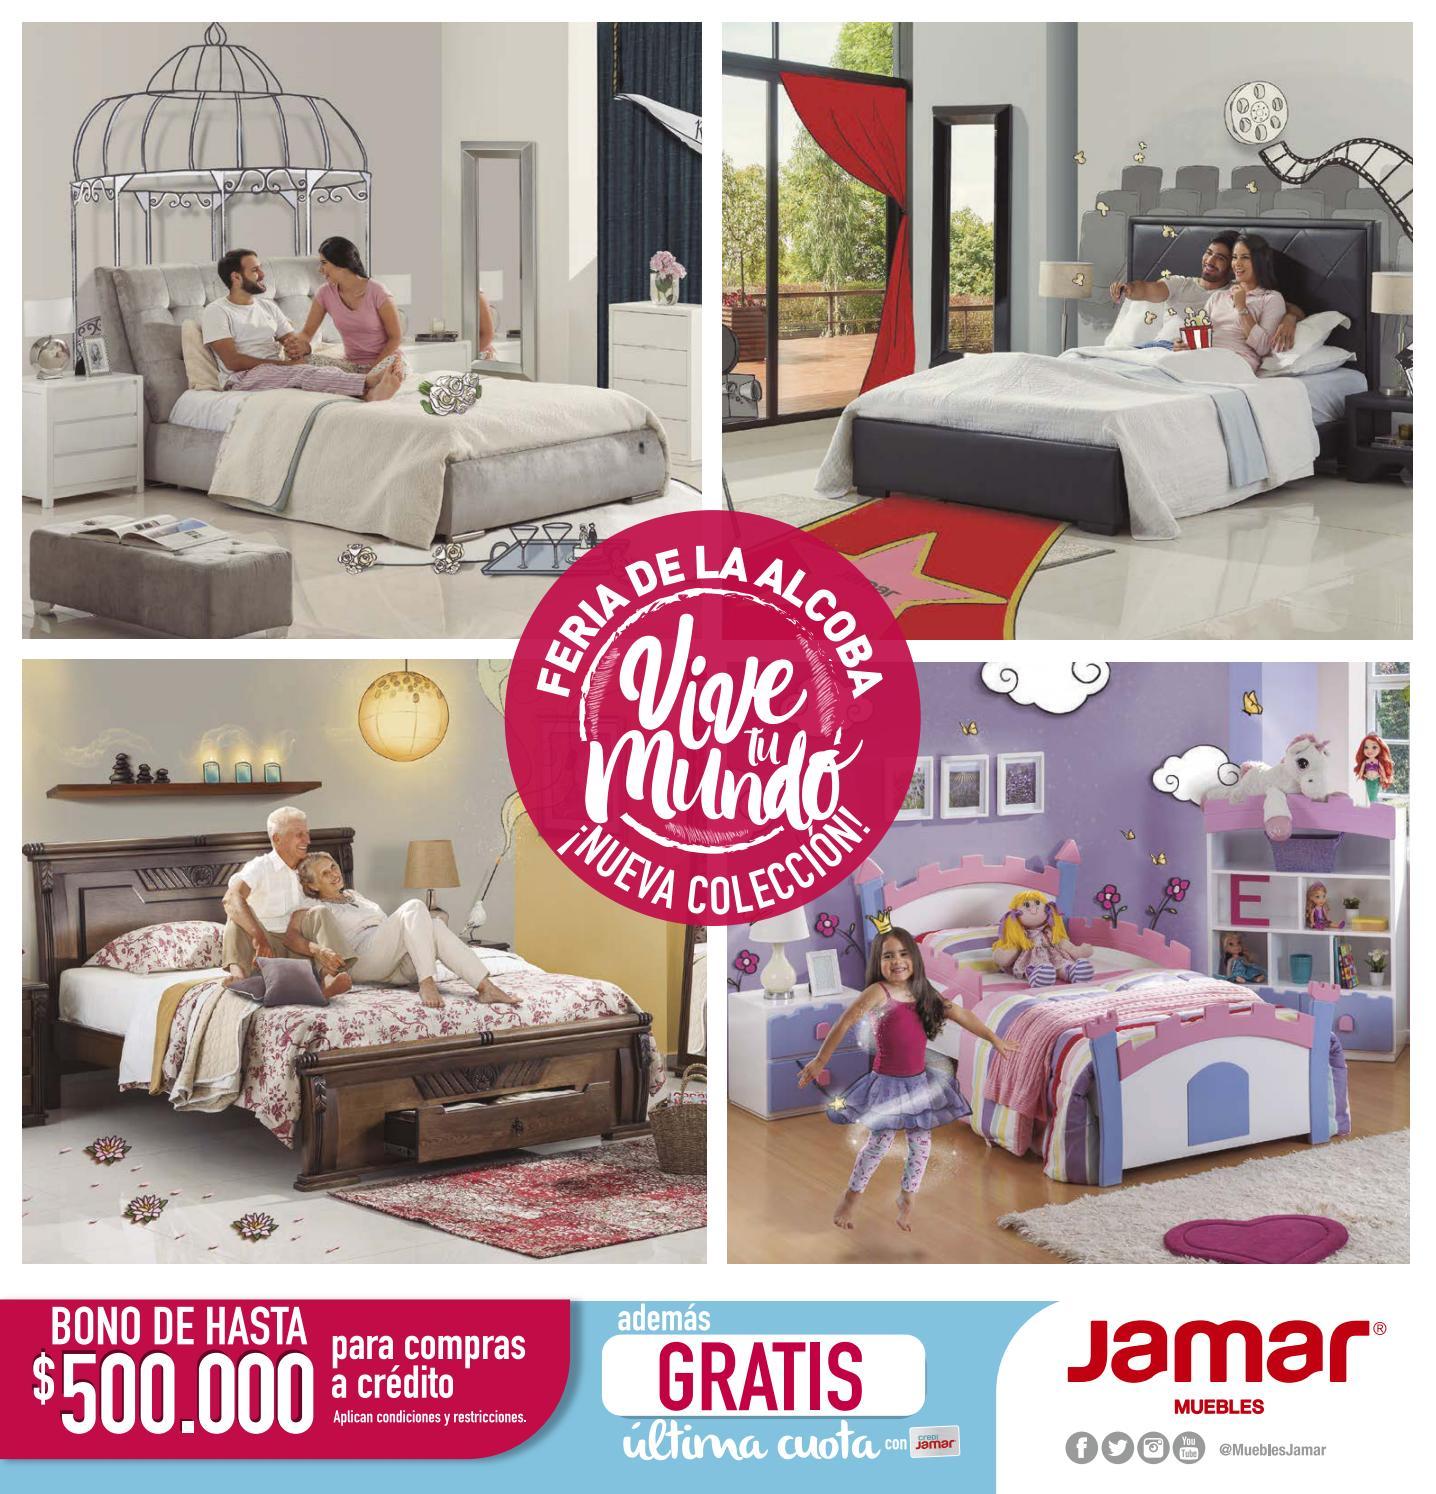 Muebles Jamar Barranquilla - Cat Logo Outlet Jamar 2017 Medellin By Www Jamar Com Issuu[mjhdah]https://image.isu.pub/160722220450-12f54038f3360425db09523cc9585c39/jpg/page_1.jpg